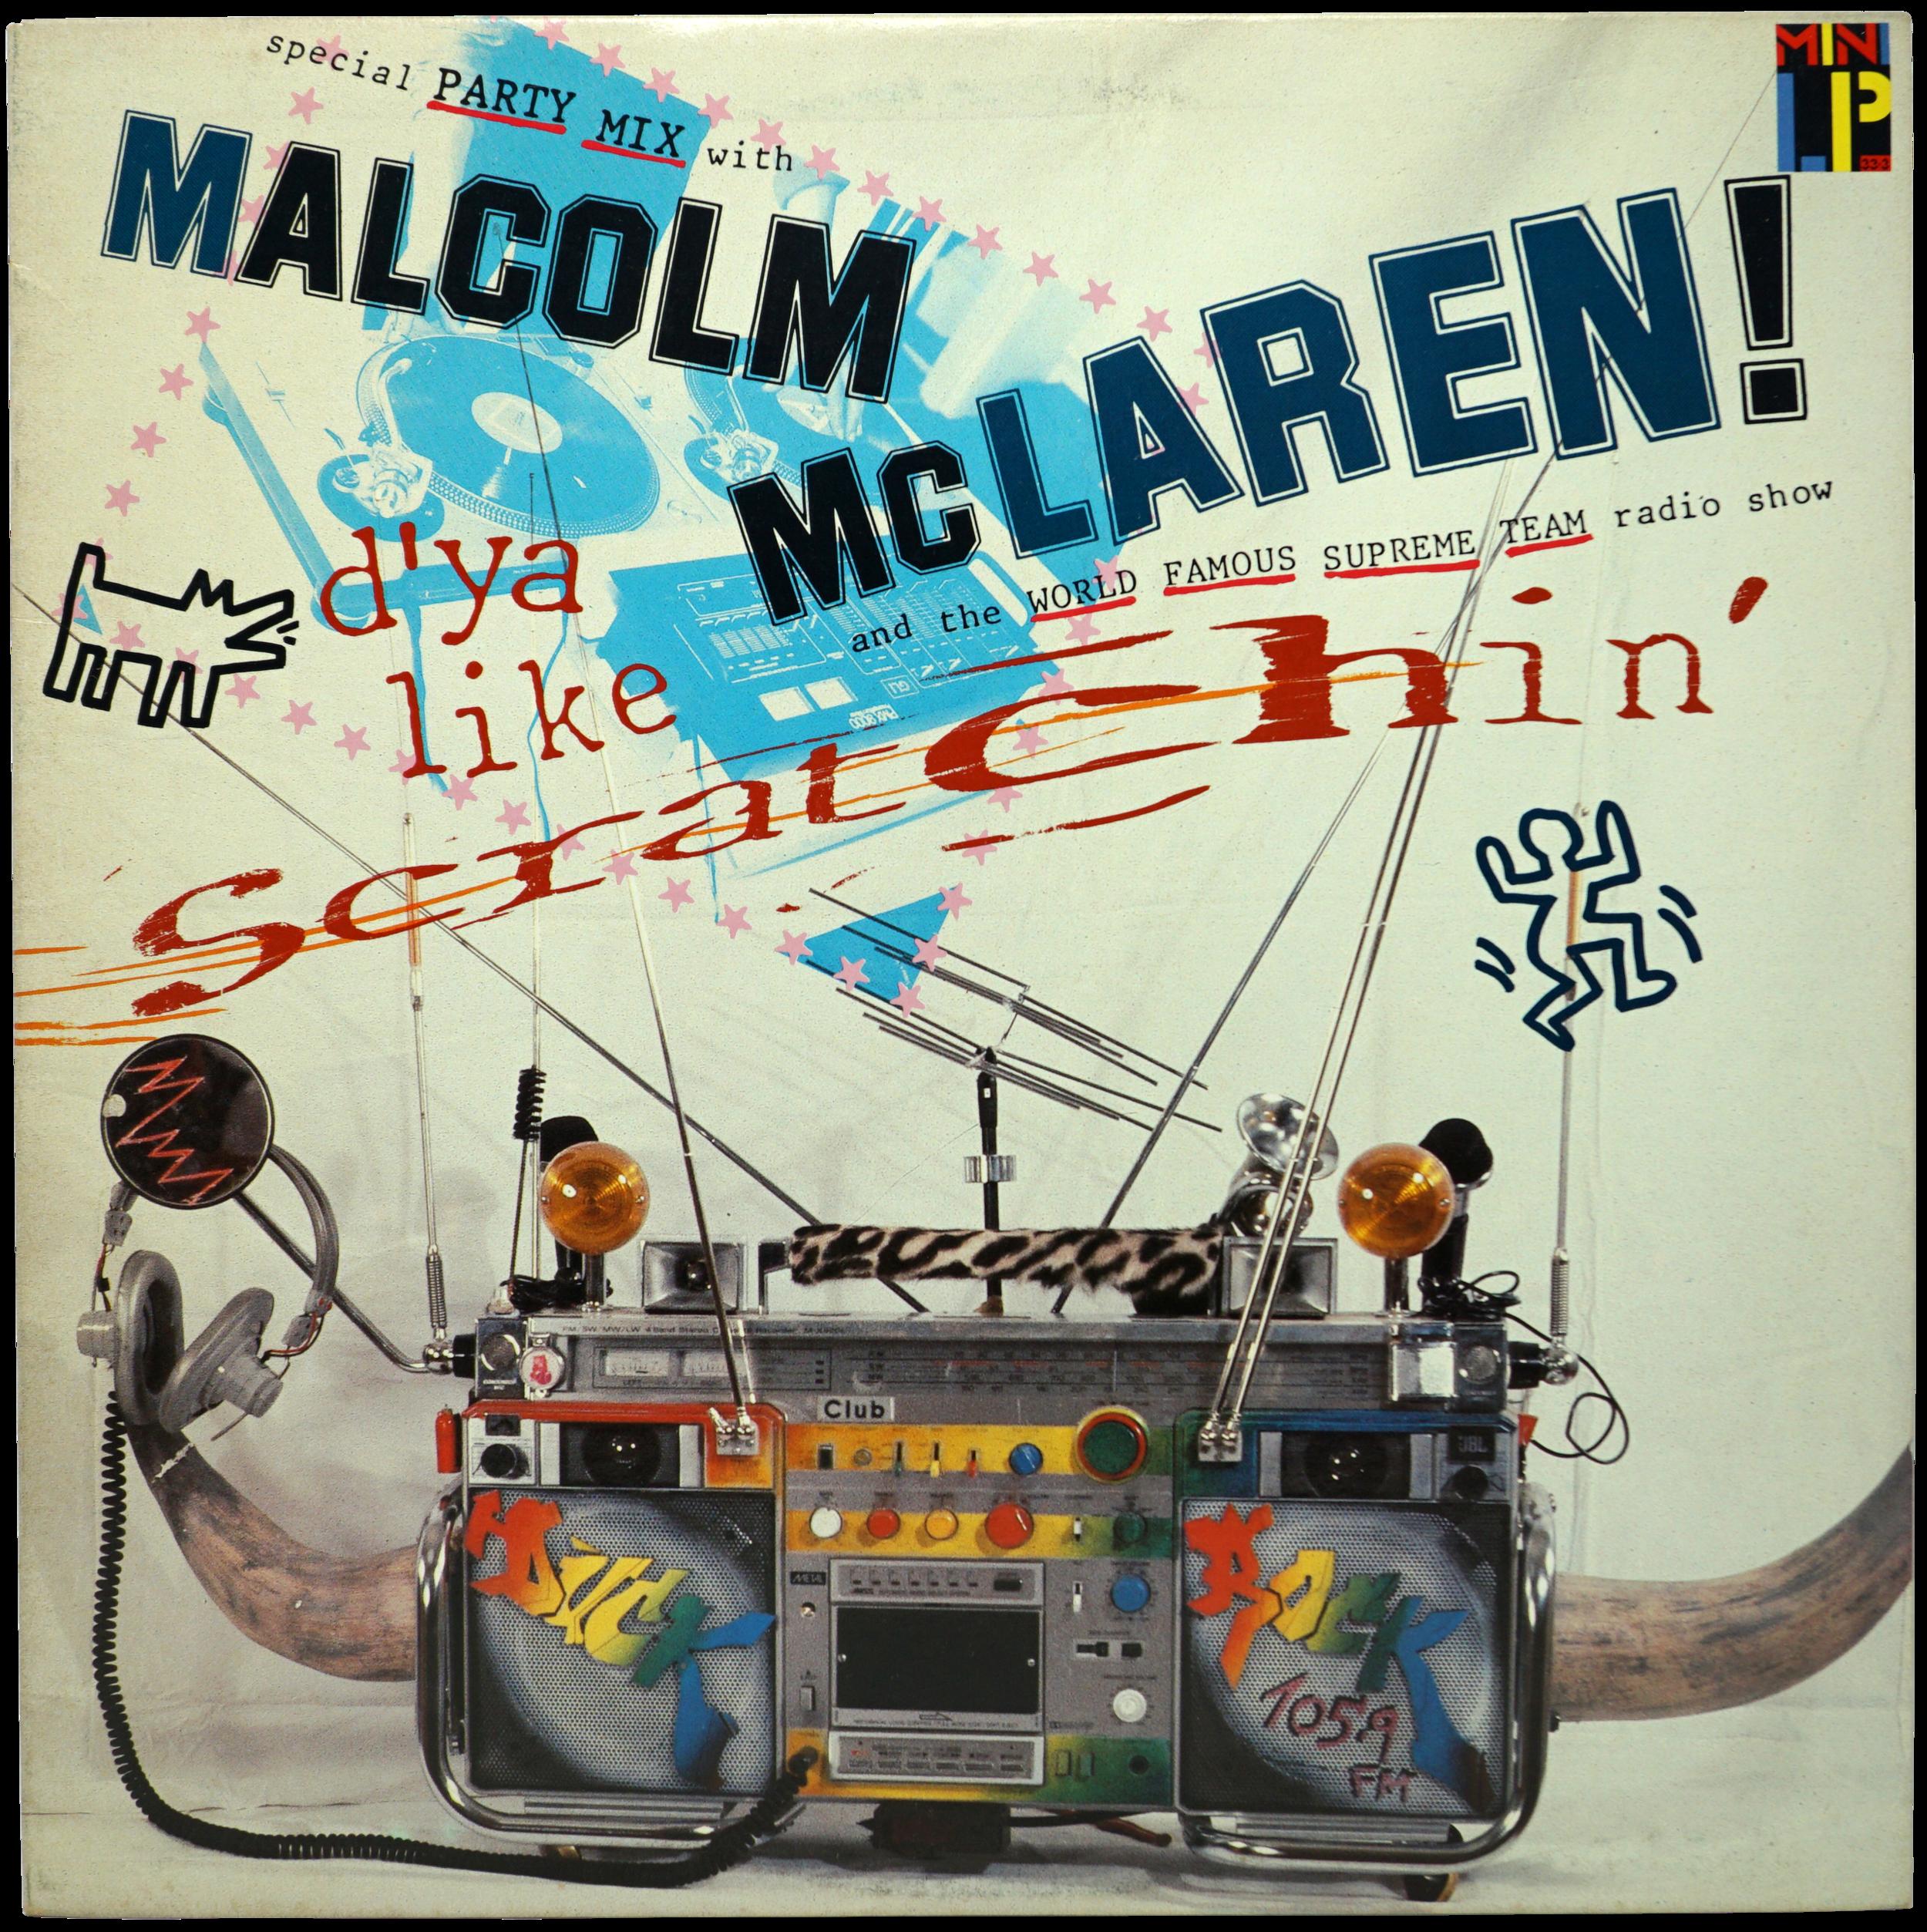 WLWLTDOO-1983-12-MALCOM_MCLAREN-DO_YA_LIKE_SCRATCHIN-COVER-901241B.png